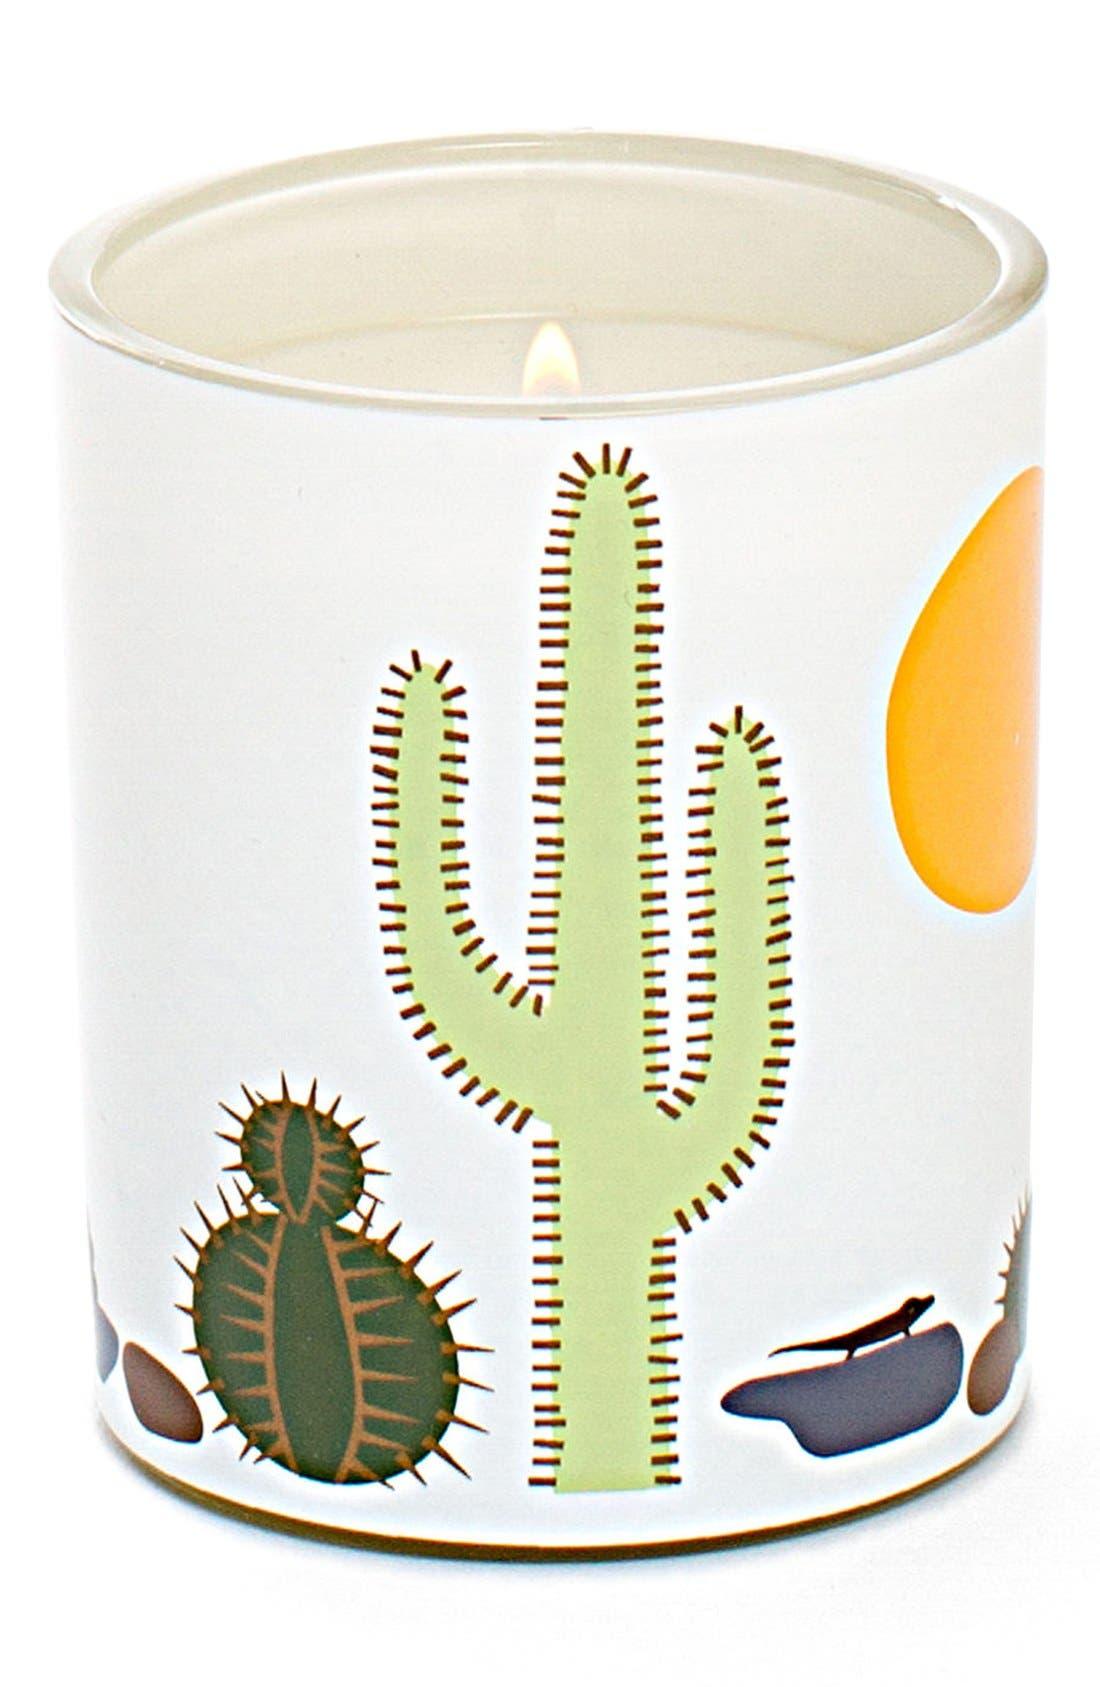 R. Nichols 'Spirit' Scented Candle